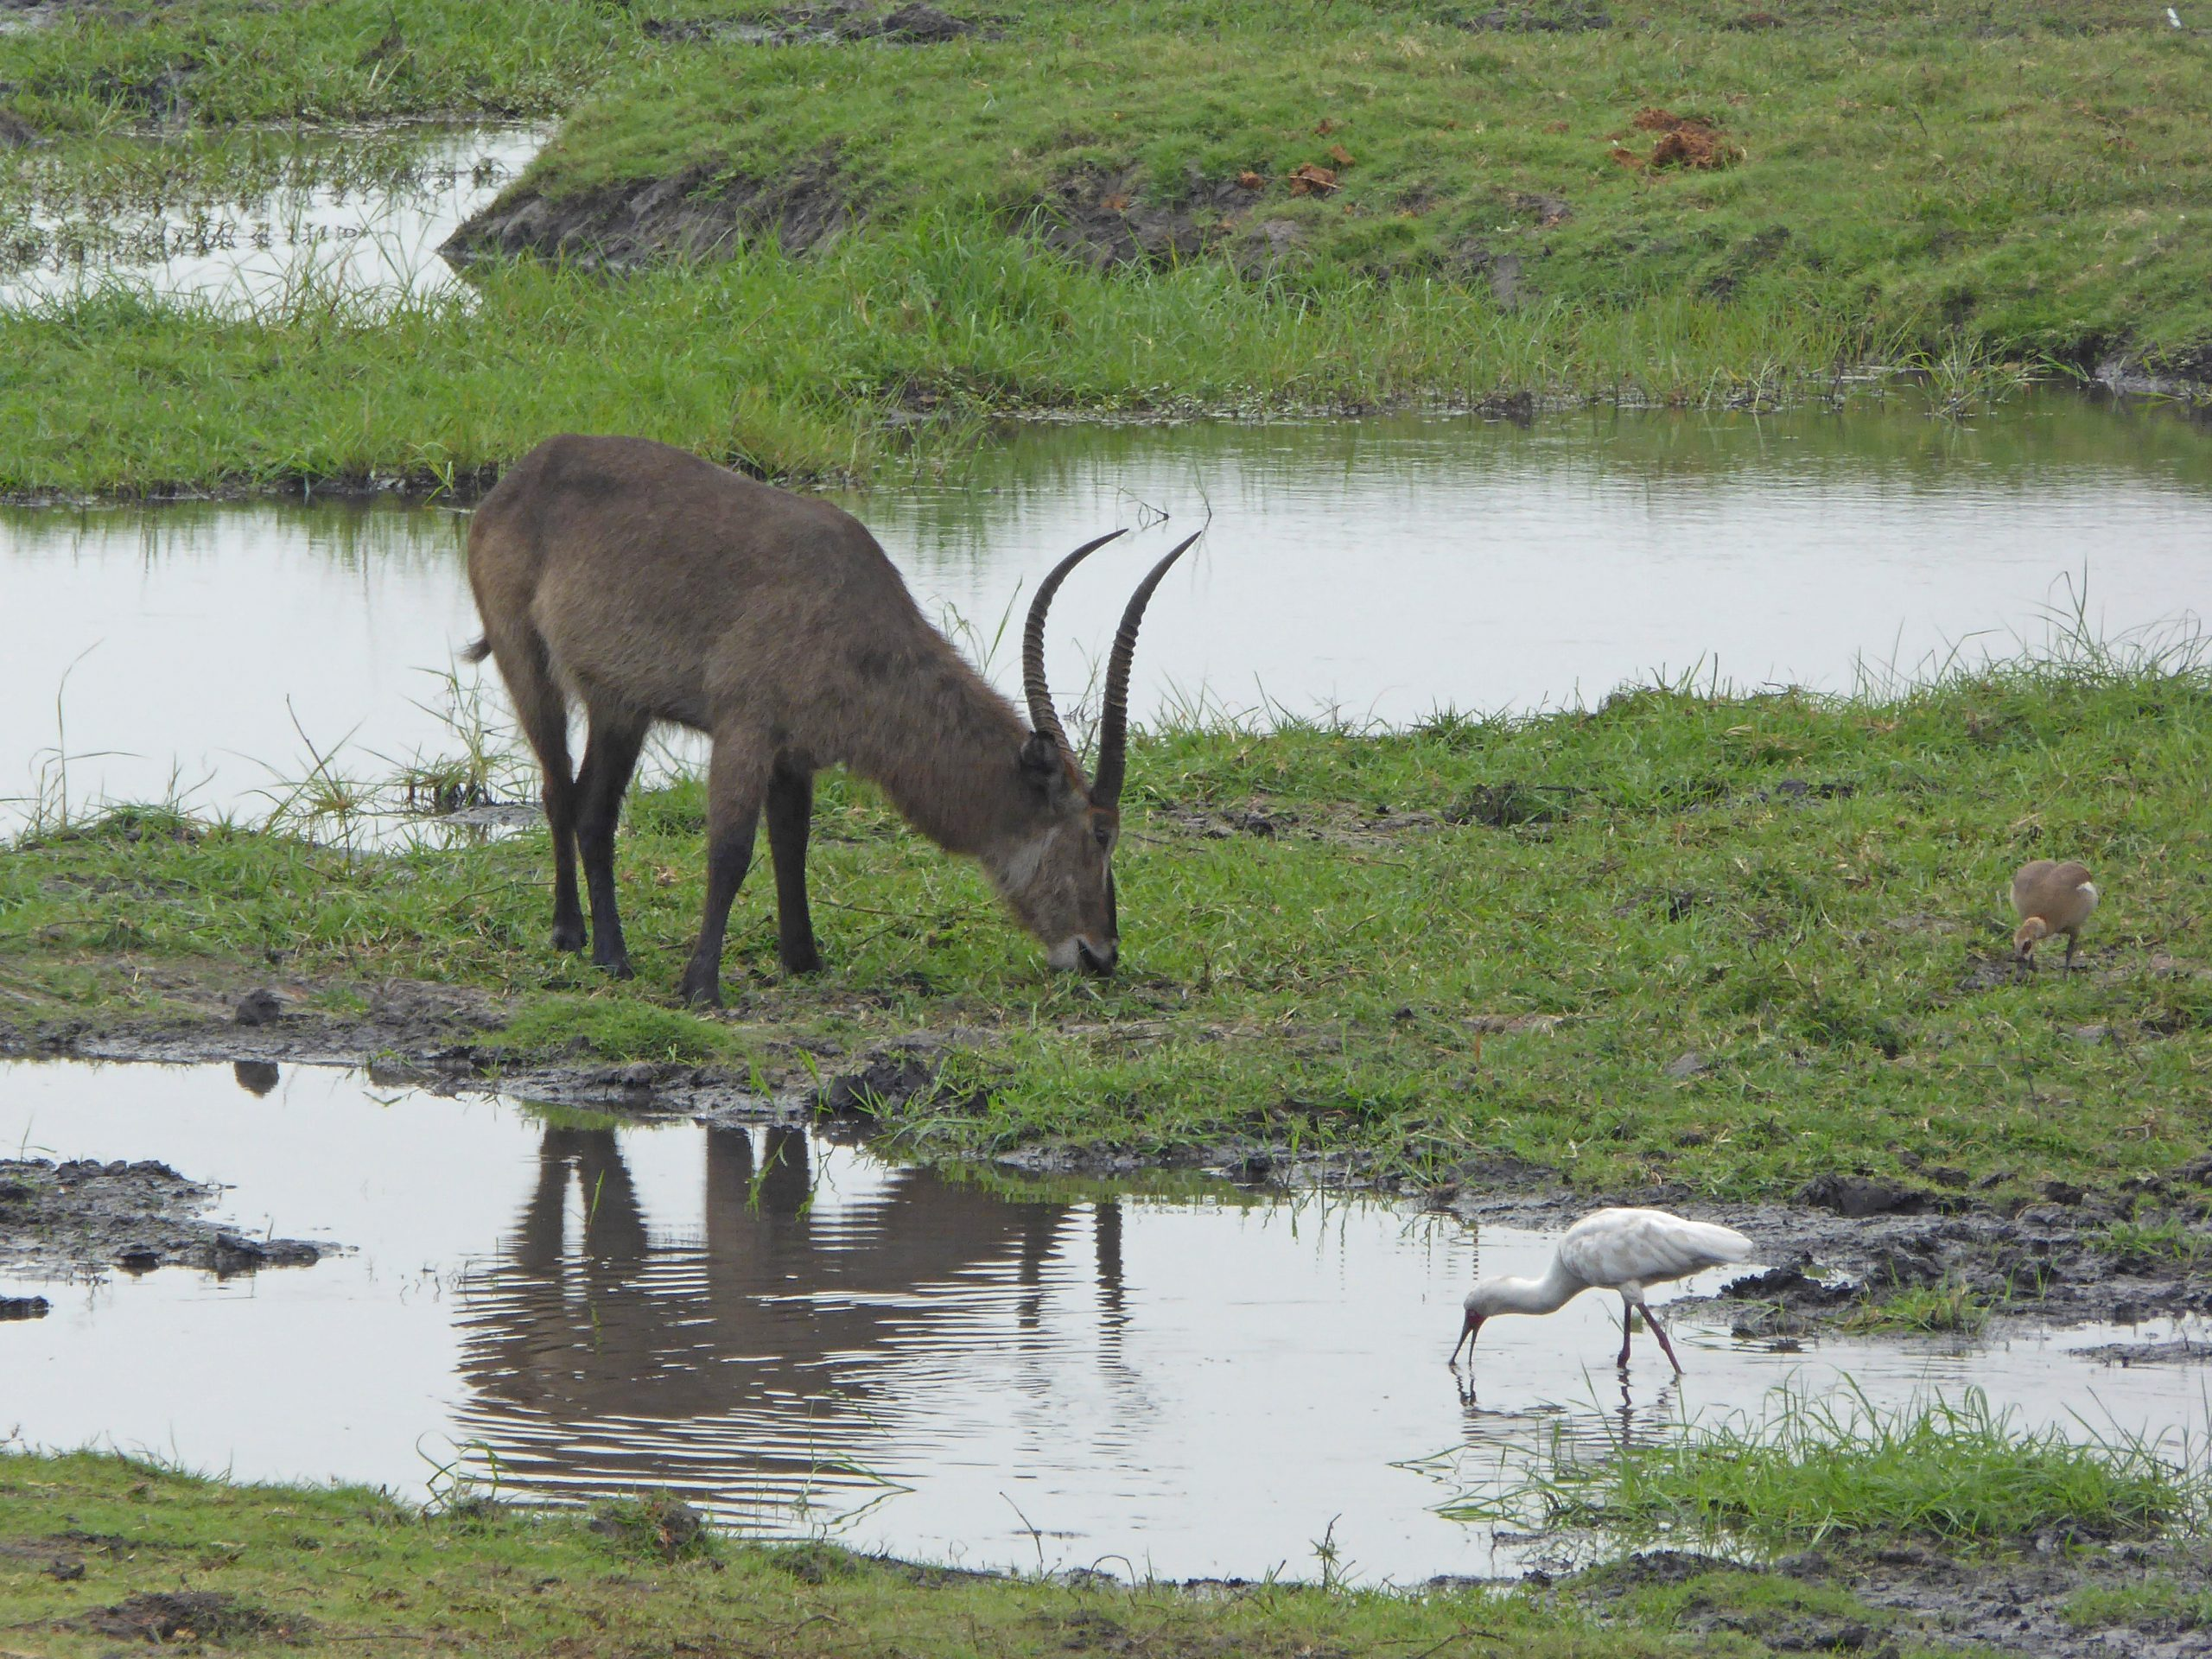 Radreise Afrika 2014 - Chobe NP - Wasserbock